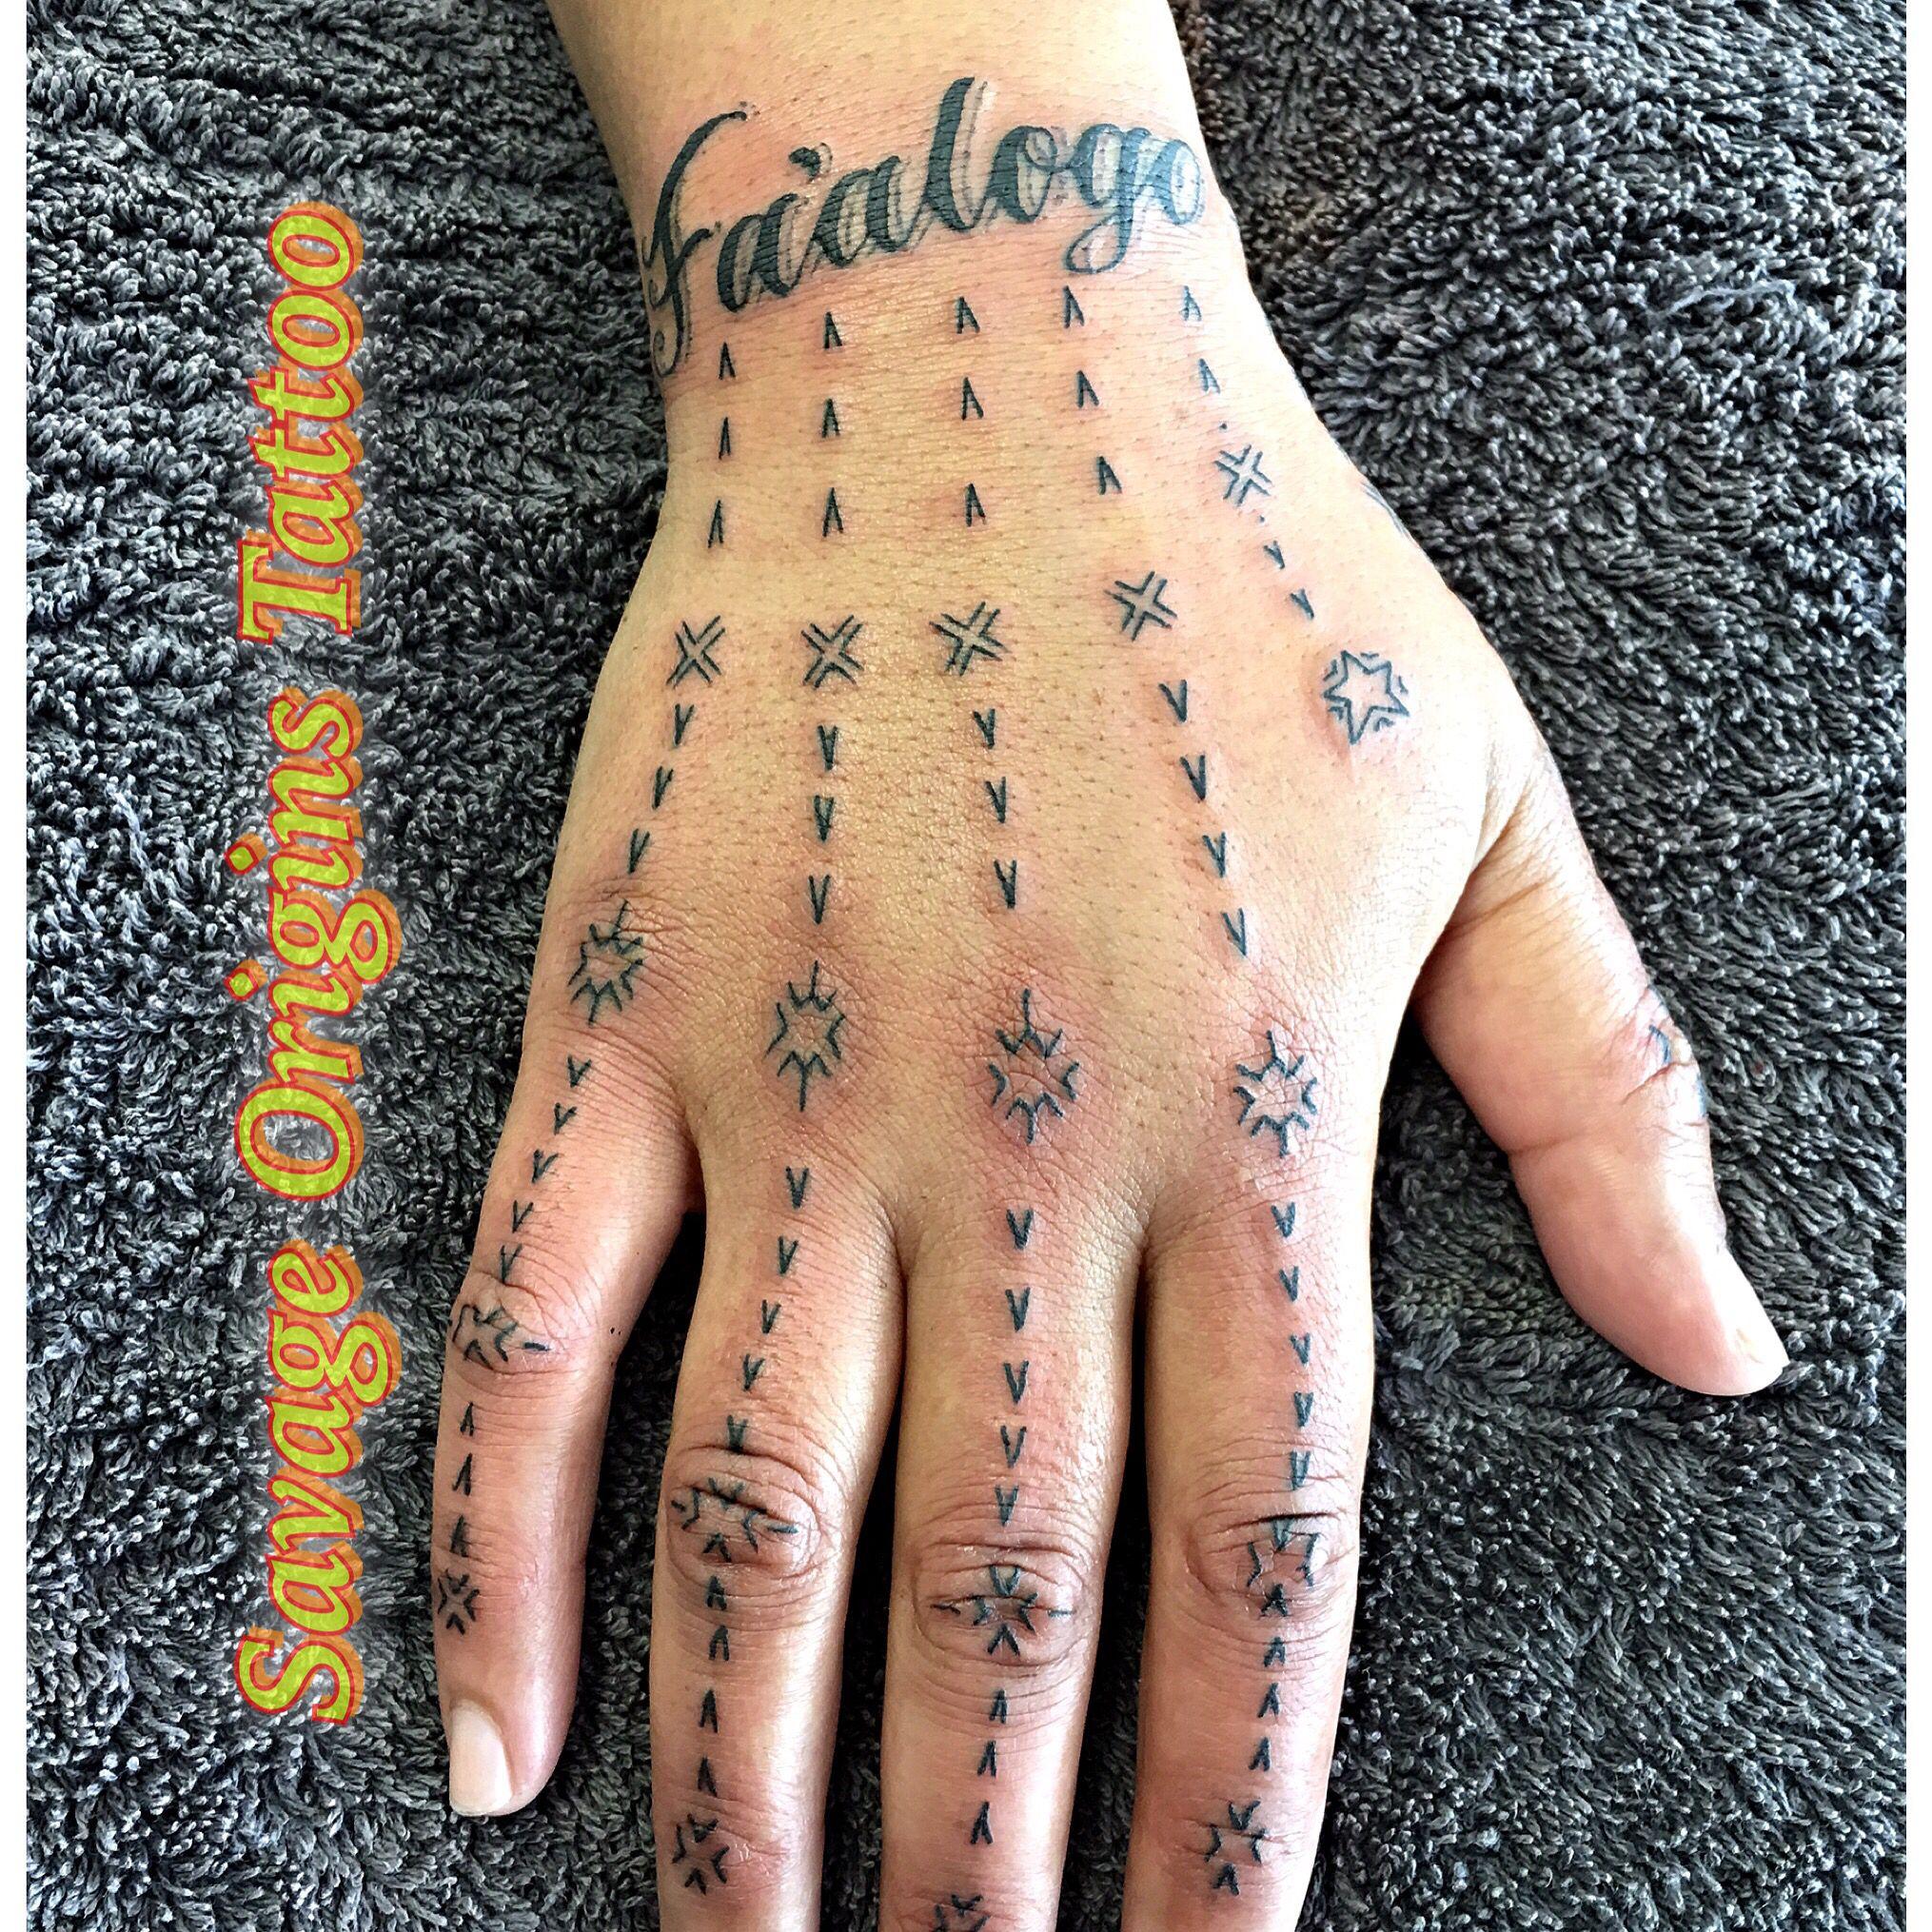 Samoan Hand Tattoo Hawaiian Tattoo Polynesian Tattoos Women Hand Tattoos